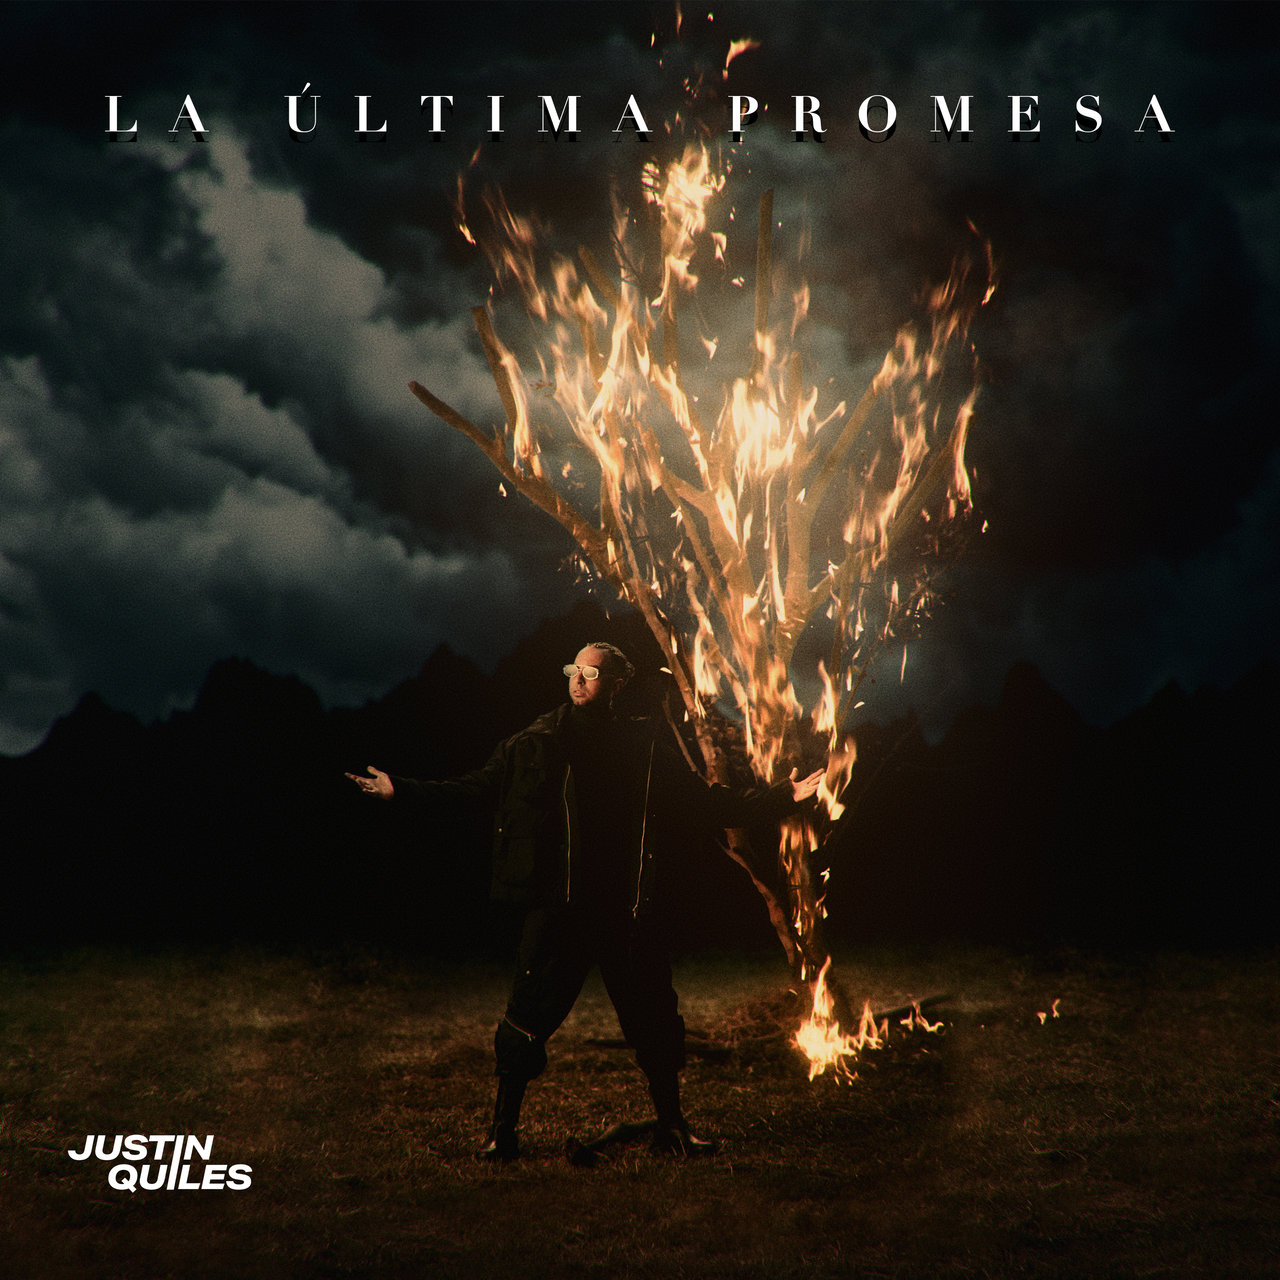 Justin Quiles - La Última Promesa (Cover)